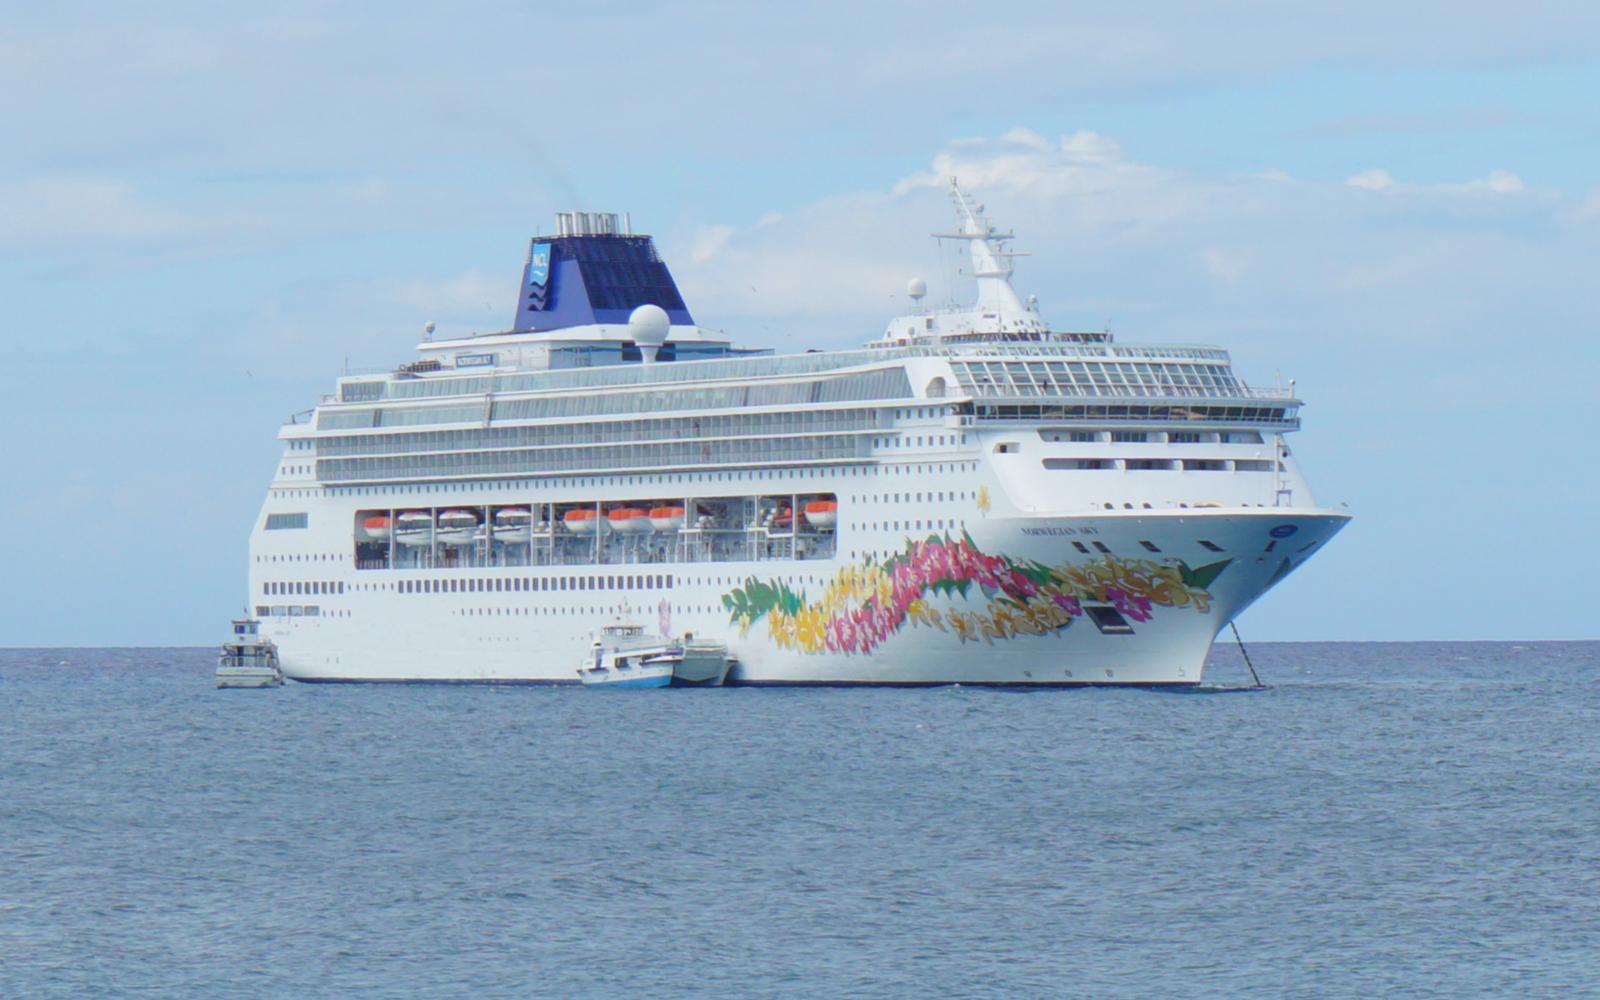 An Honest Review of Norwegian Sky Cruise to Havana, Cuba & Bahamas